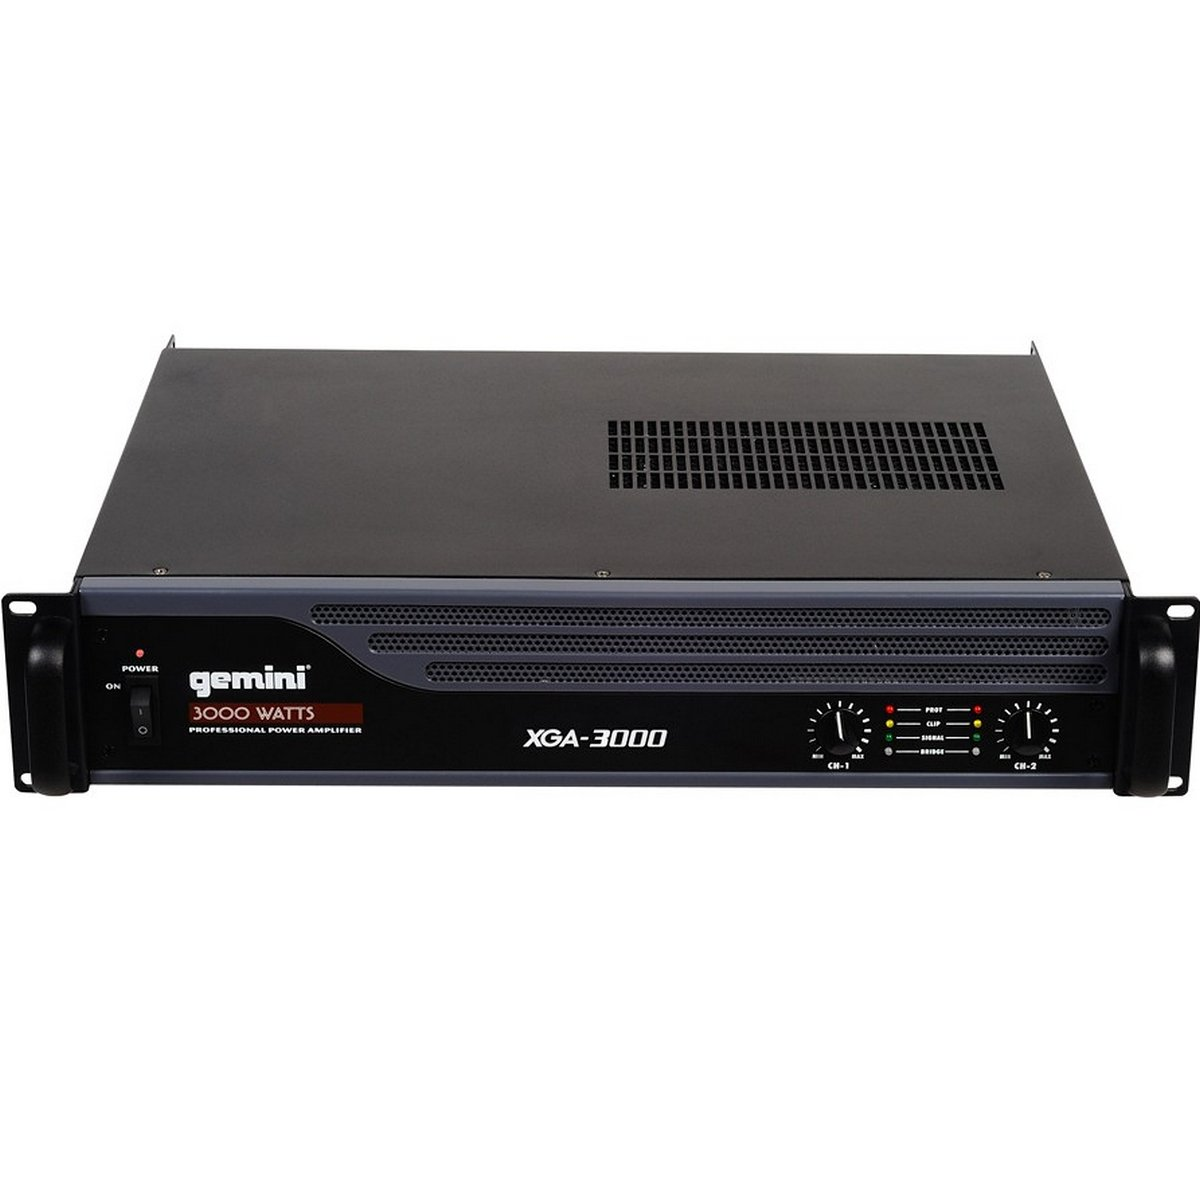 Gemini XGA Series XGA-3000 Professional Quality PA System DJ Equipment Power Amplifier with 3000 Watt Instant Peak Power